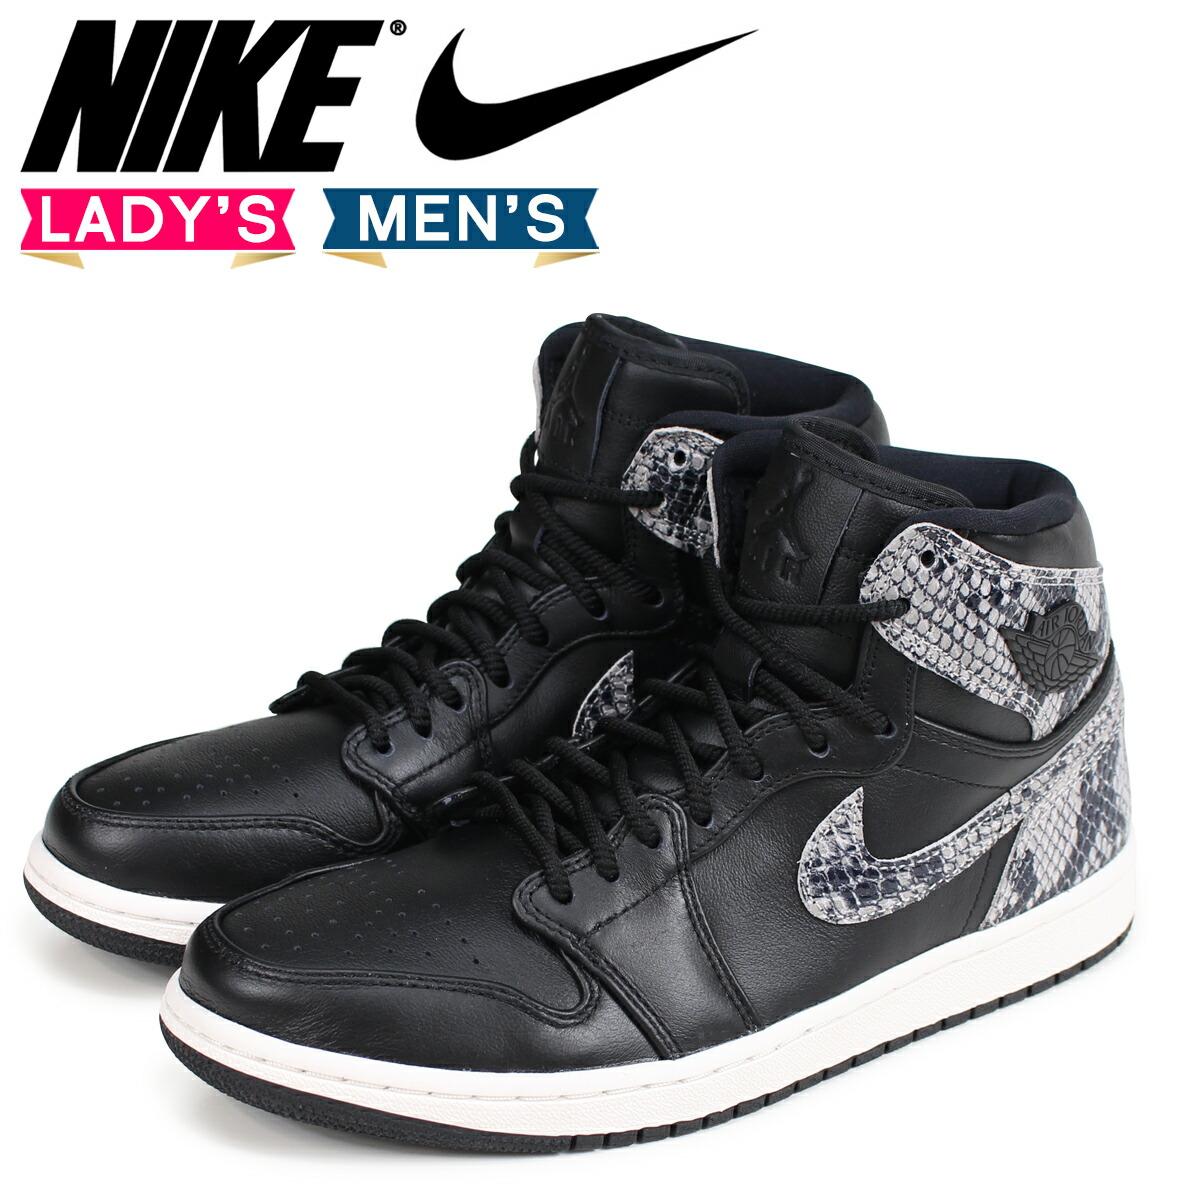 d471af3f446cf6 Sugar Online Shop  NIKE Nike Air Jordan 1 lady s men s sneakers WMNS ...